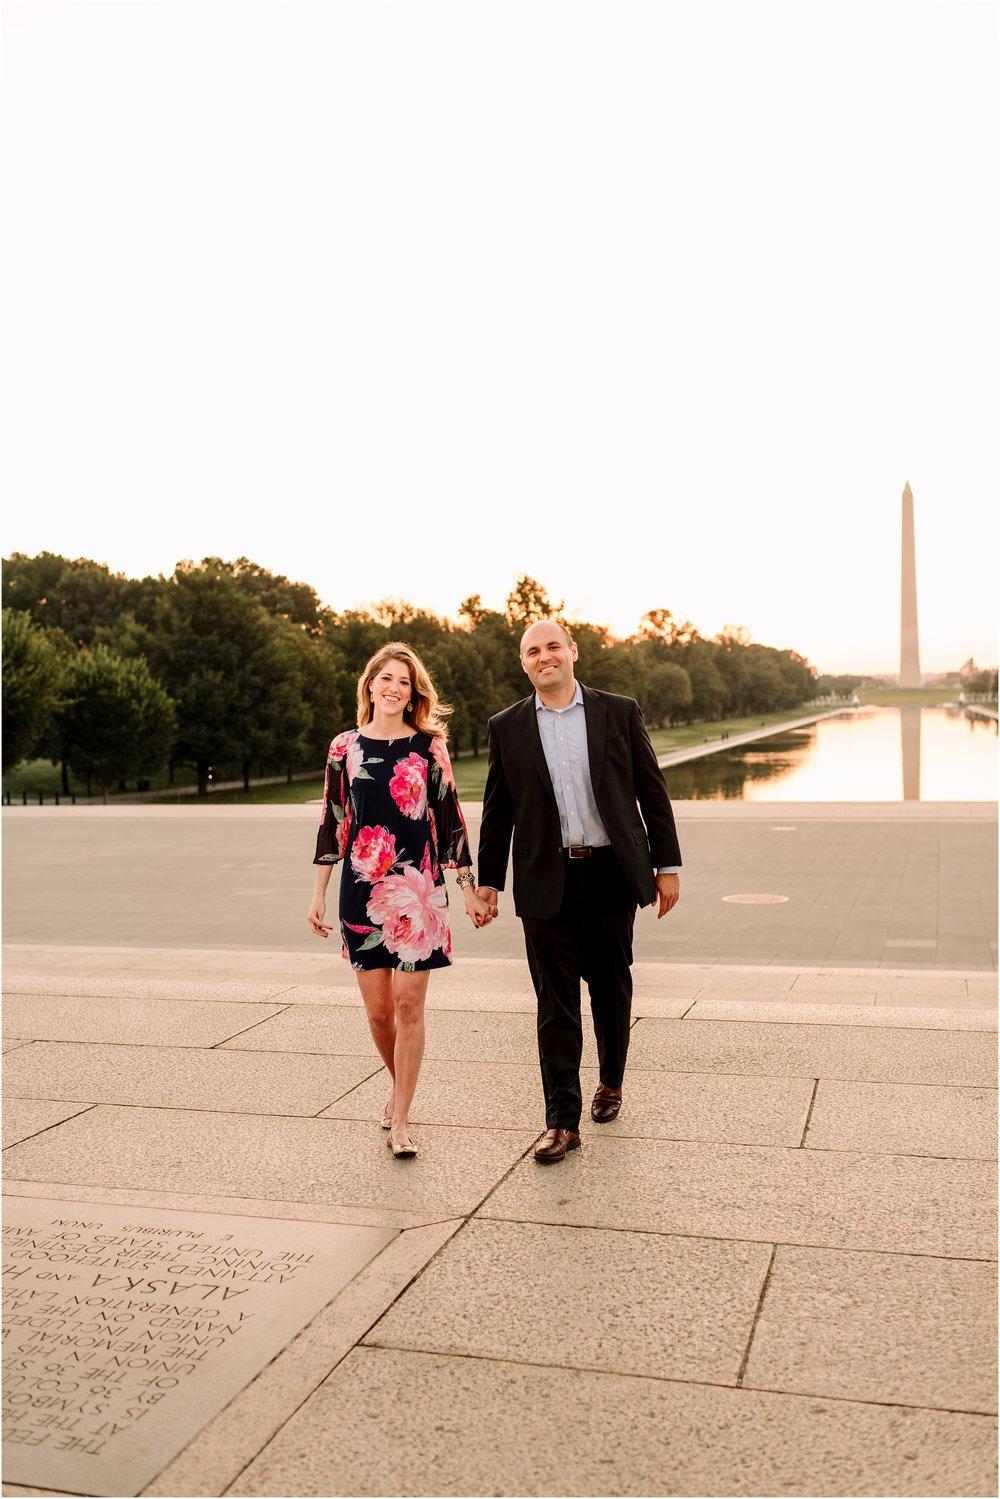 hannah leigh photography Sunrise Jefferson Memorial Engagement Session, Washington DC_1038.jpg